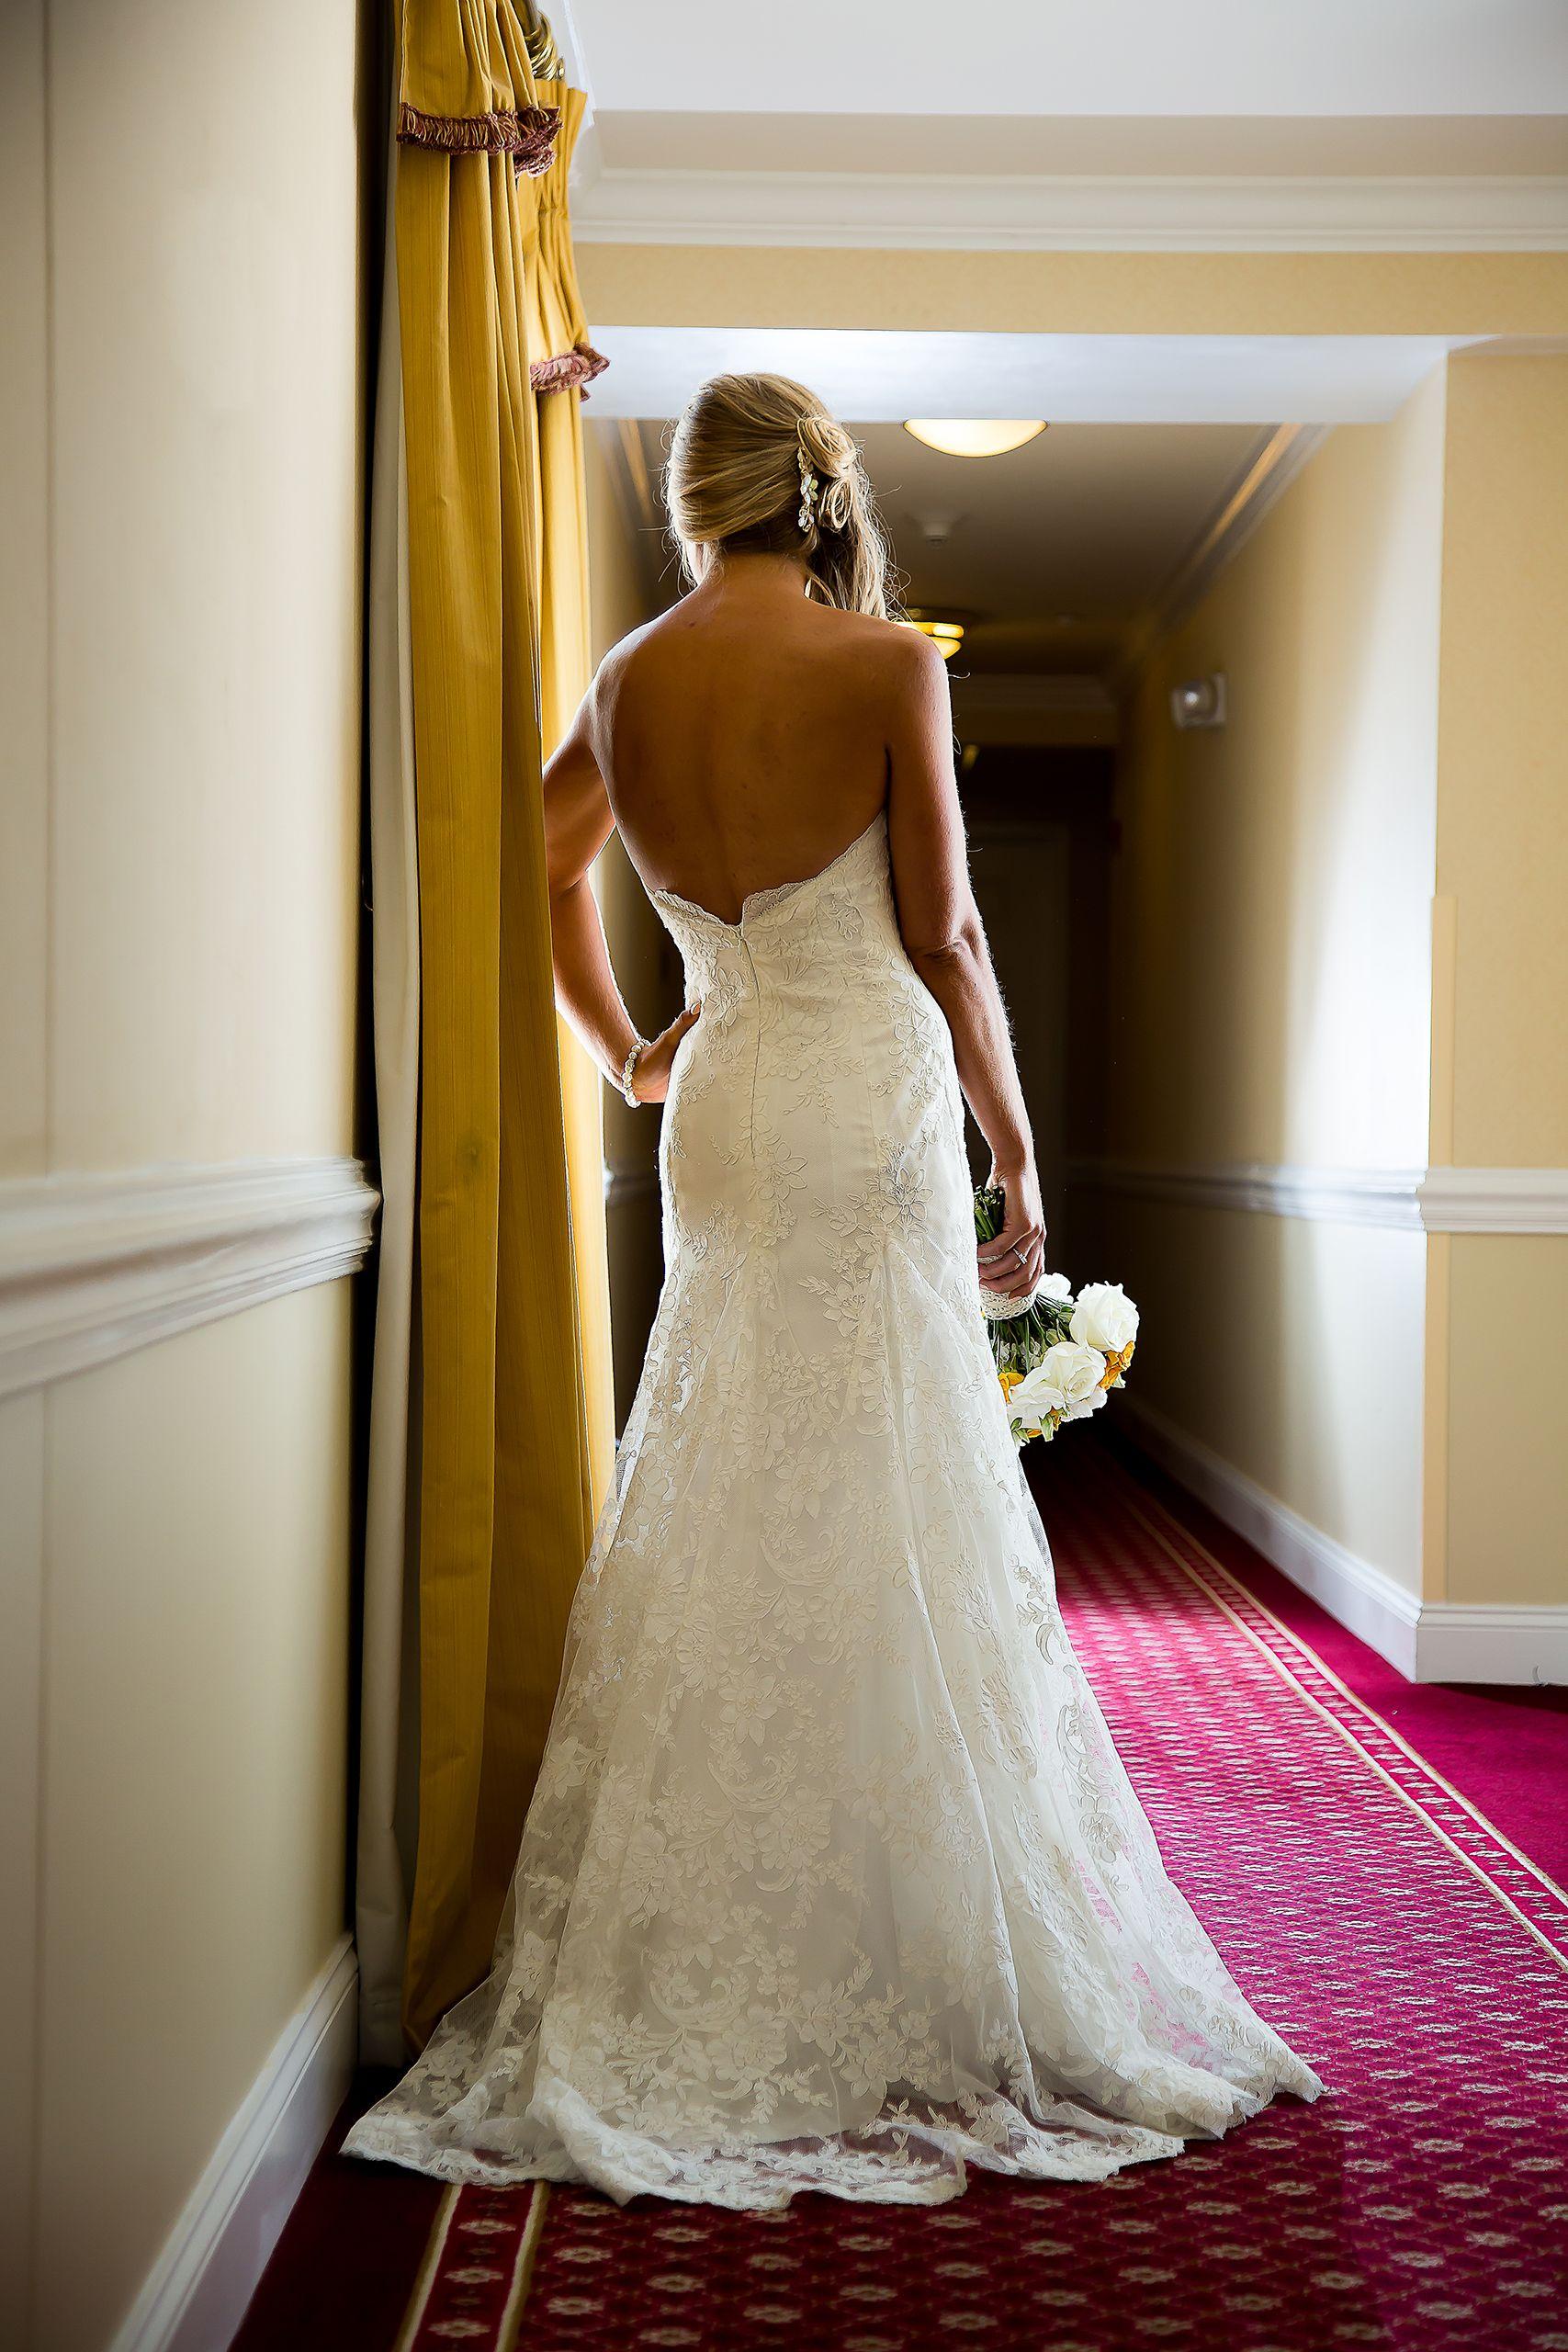 Bride-19.jpg